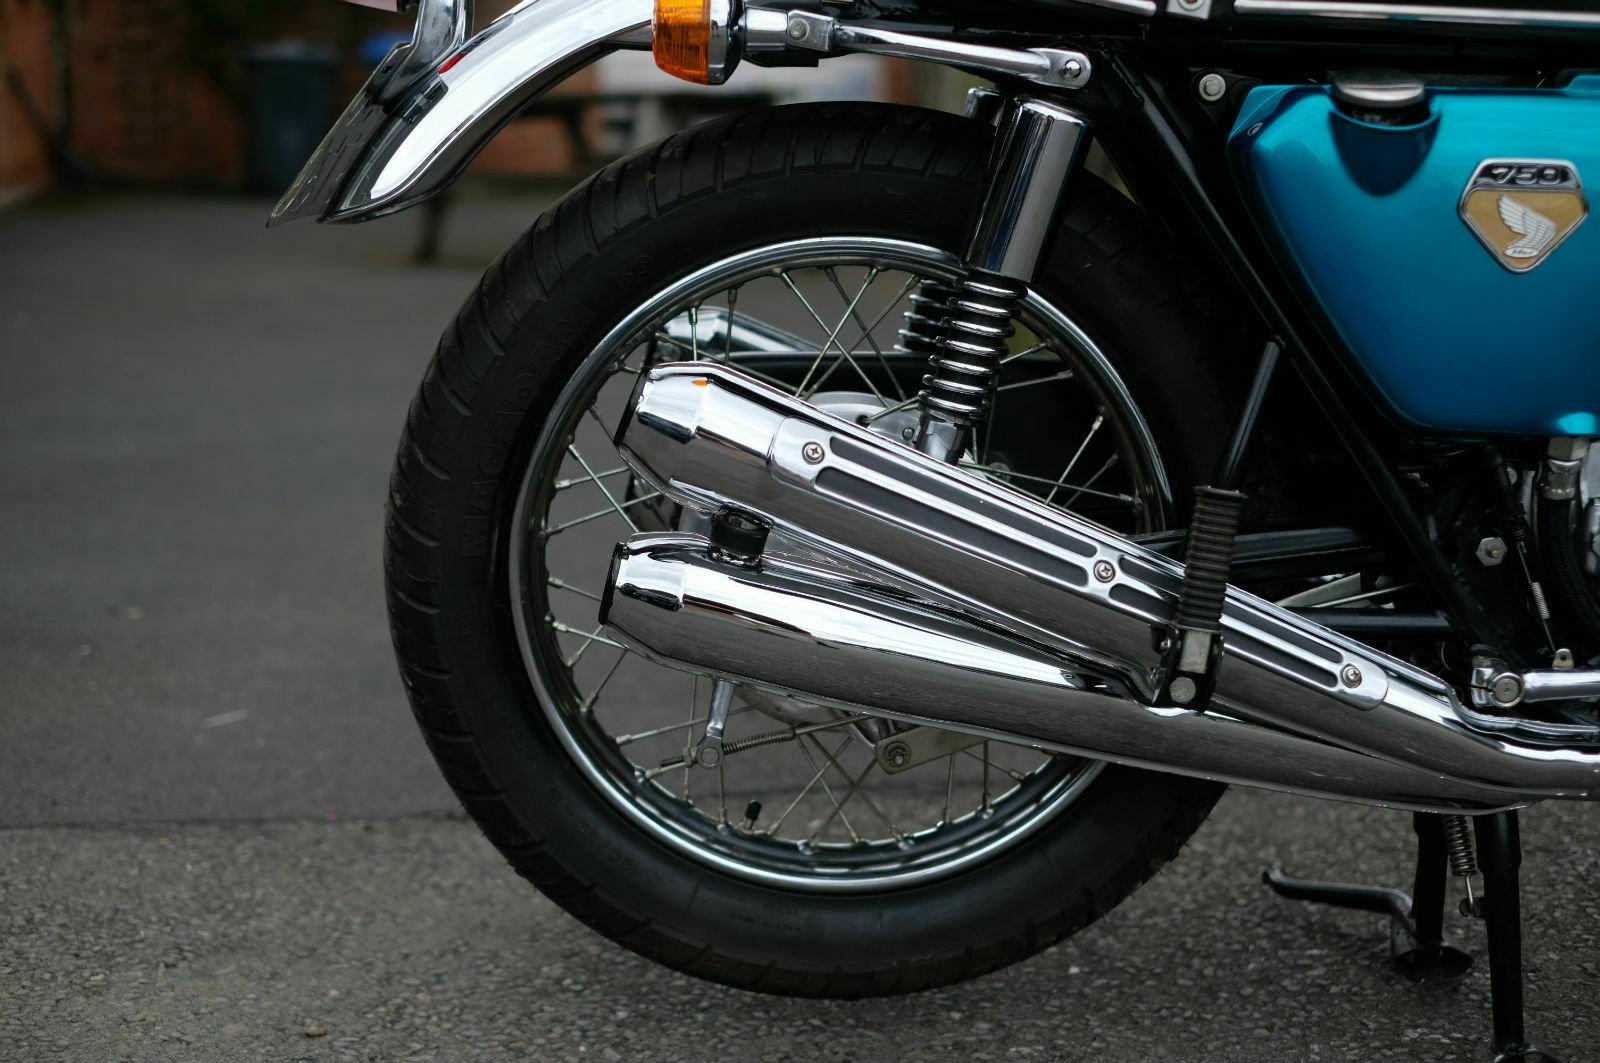 Honda CB750 CB 750 Sandcast 1969 ground up restoration *STUN SOLD (picture 3 of 6)